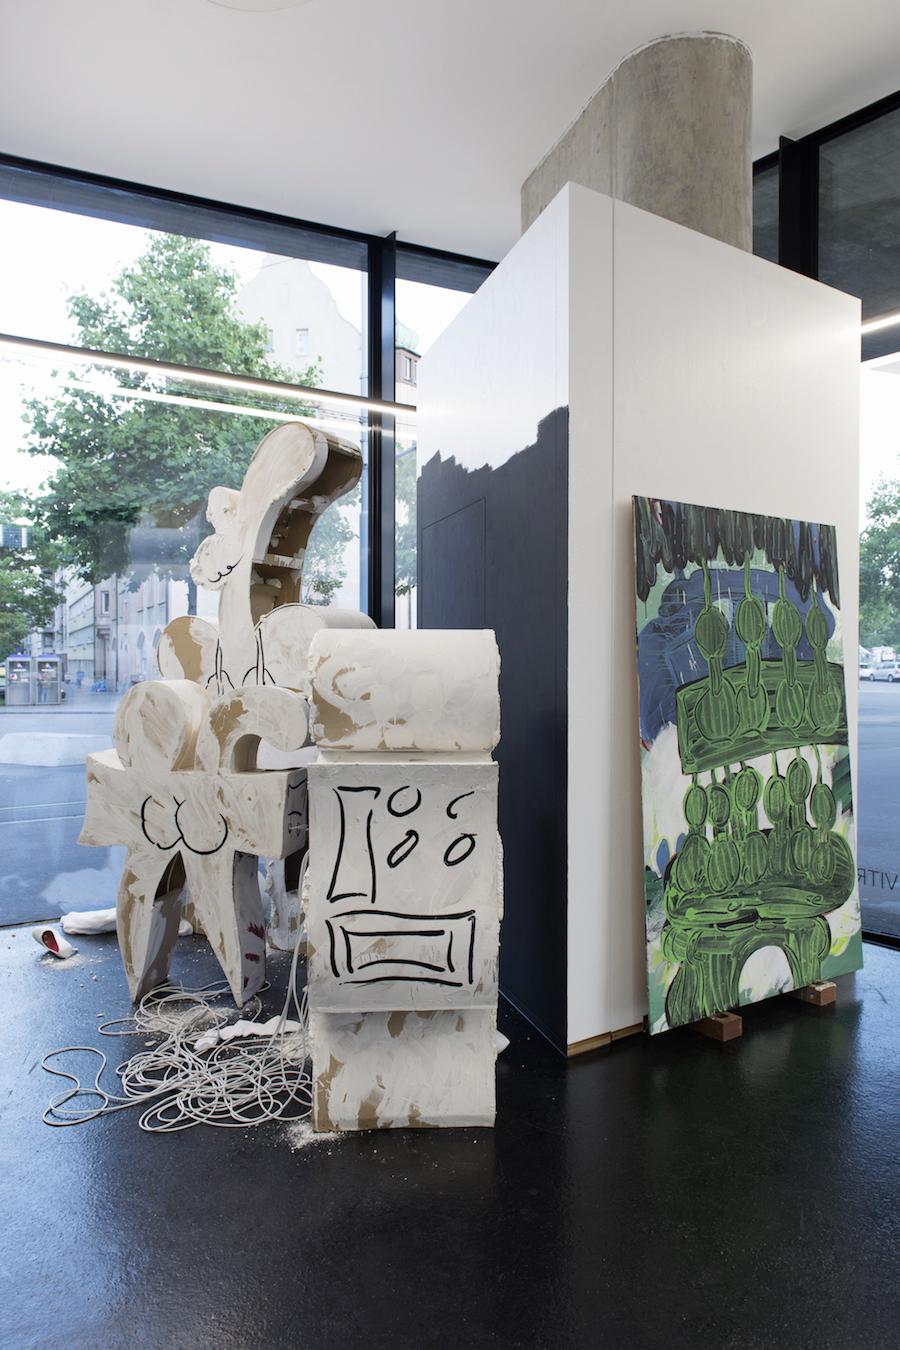 Edwin Burdis, AutoLaque, 2016. Installation view. VITRINE, Basel. Photographer: Nici Jost.